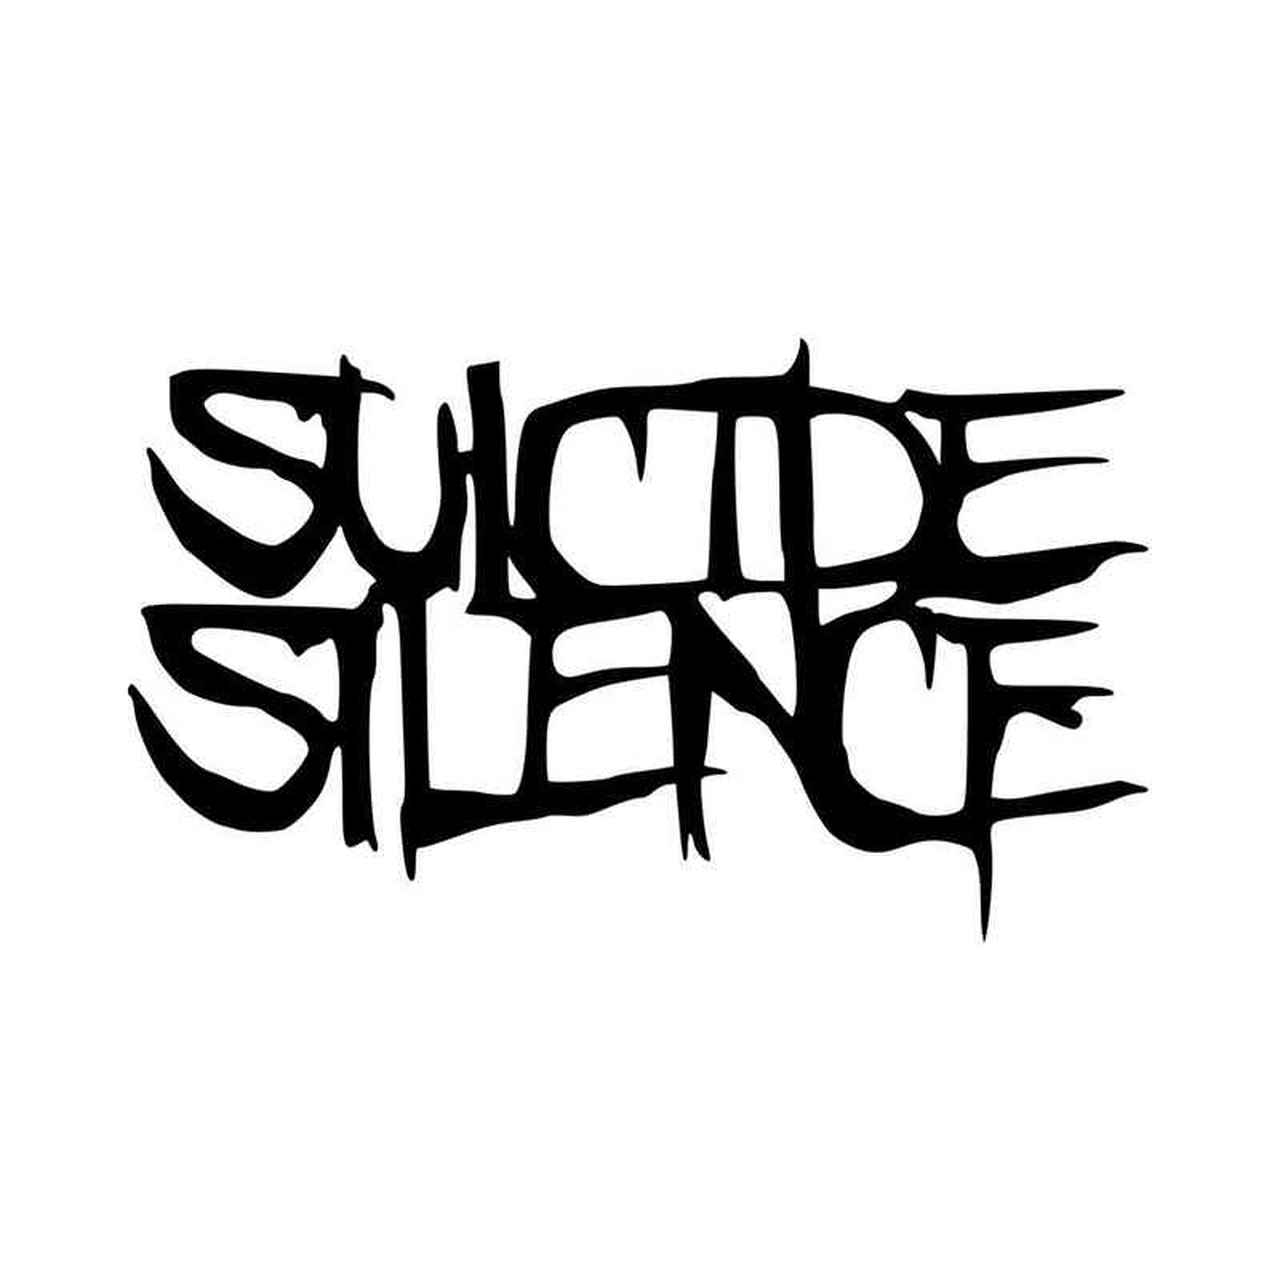 Suicide Silence Logo Vinyl Decal Sticker.